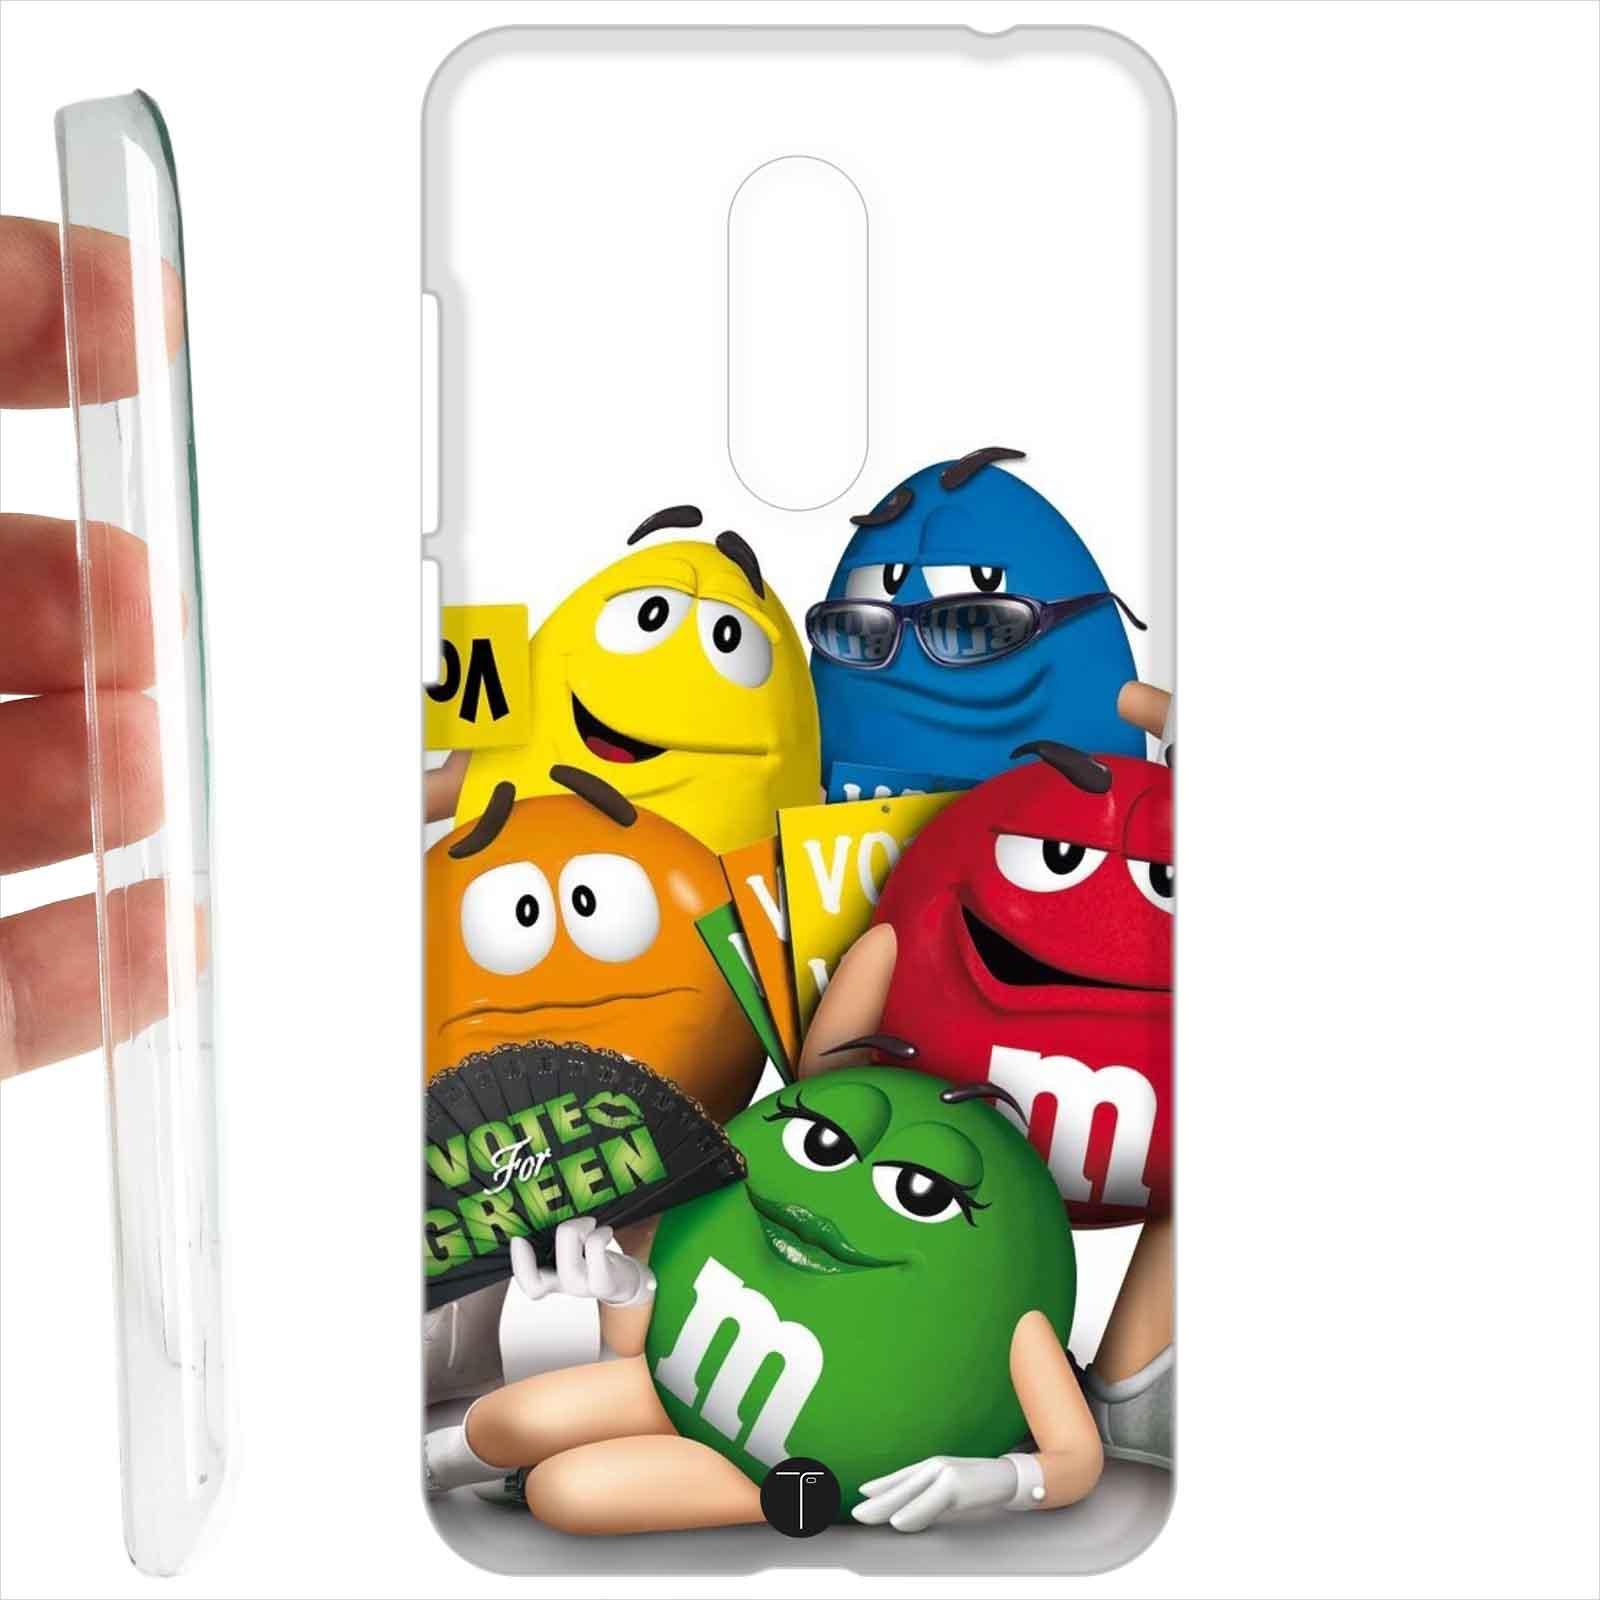 Custodia-cover-RIGIDA-per-Xiaomi-Redmi-5-Plus-Design-73-91